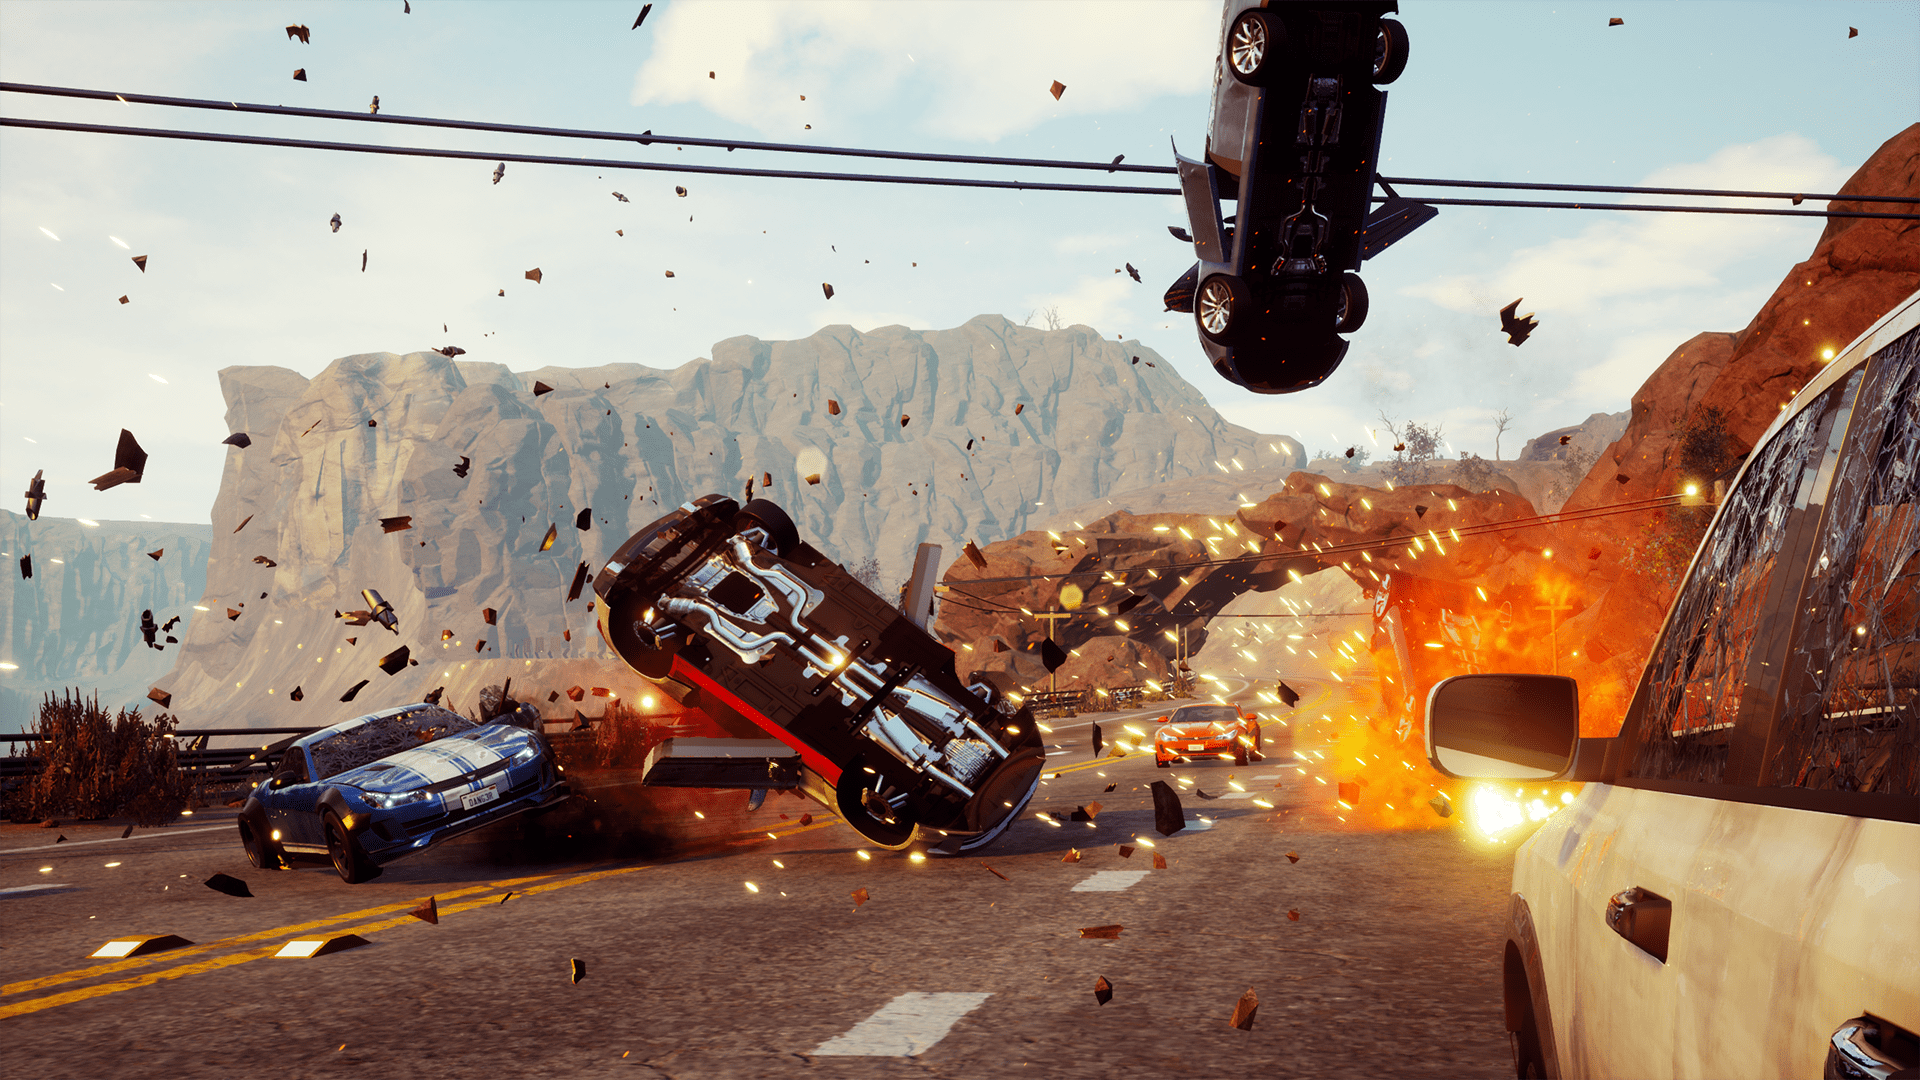 Arcade Racing Game Dangerous Driving 2019 Single Player Online